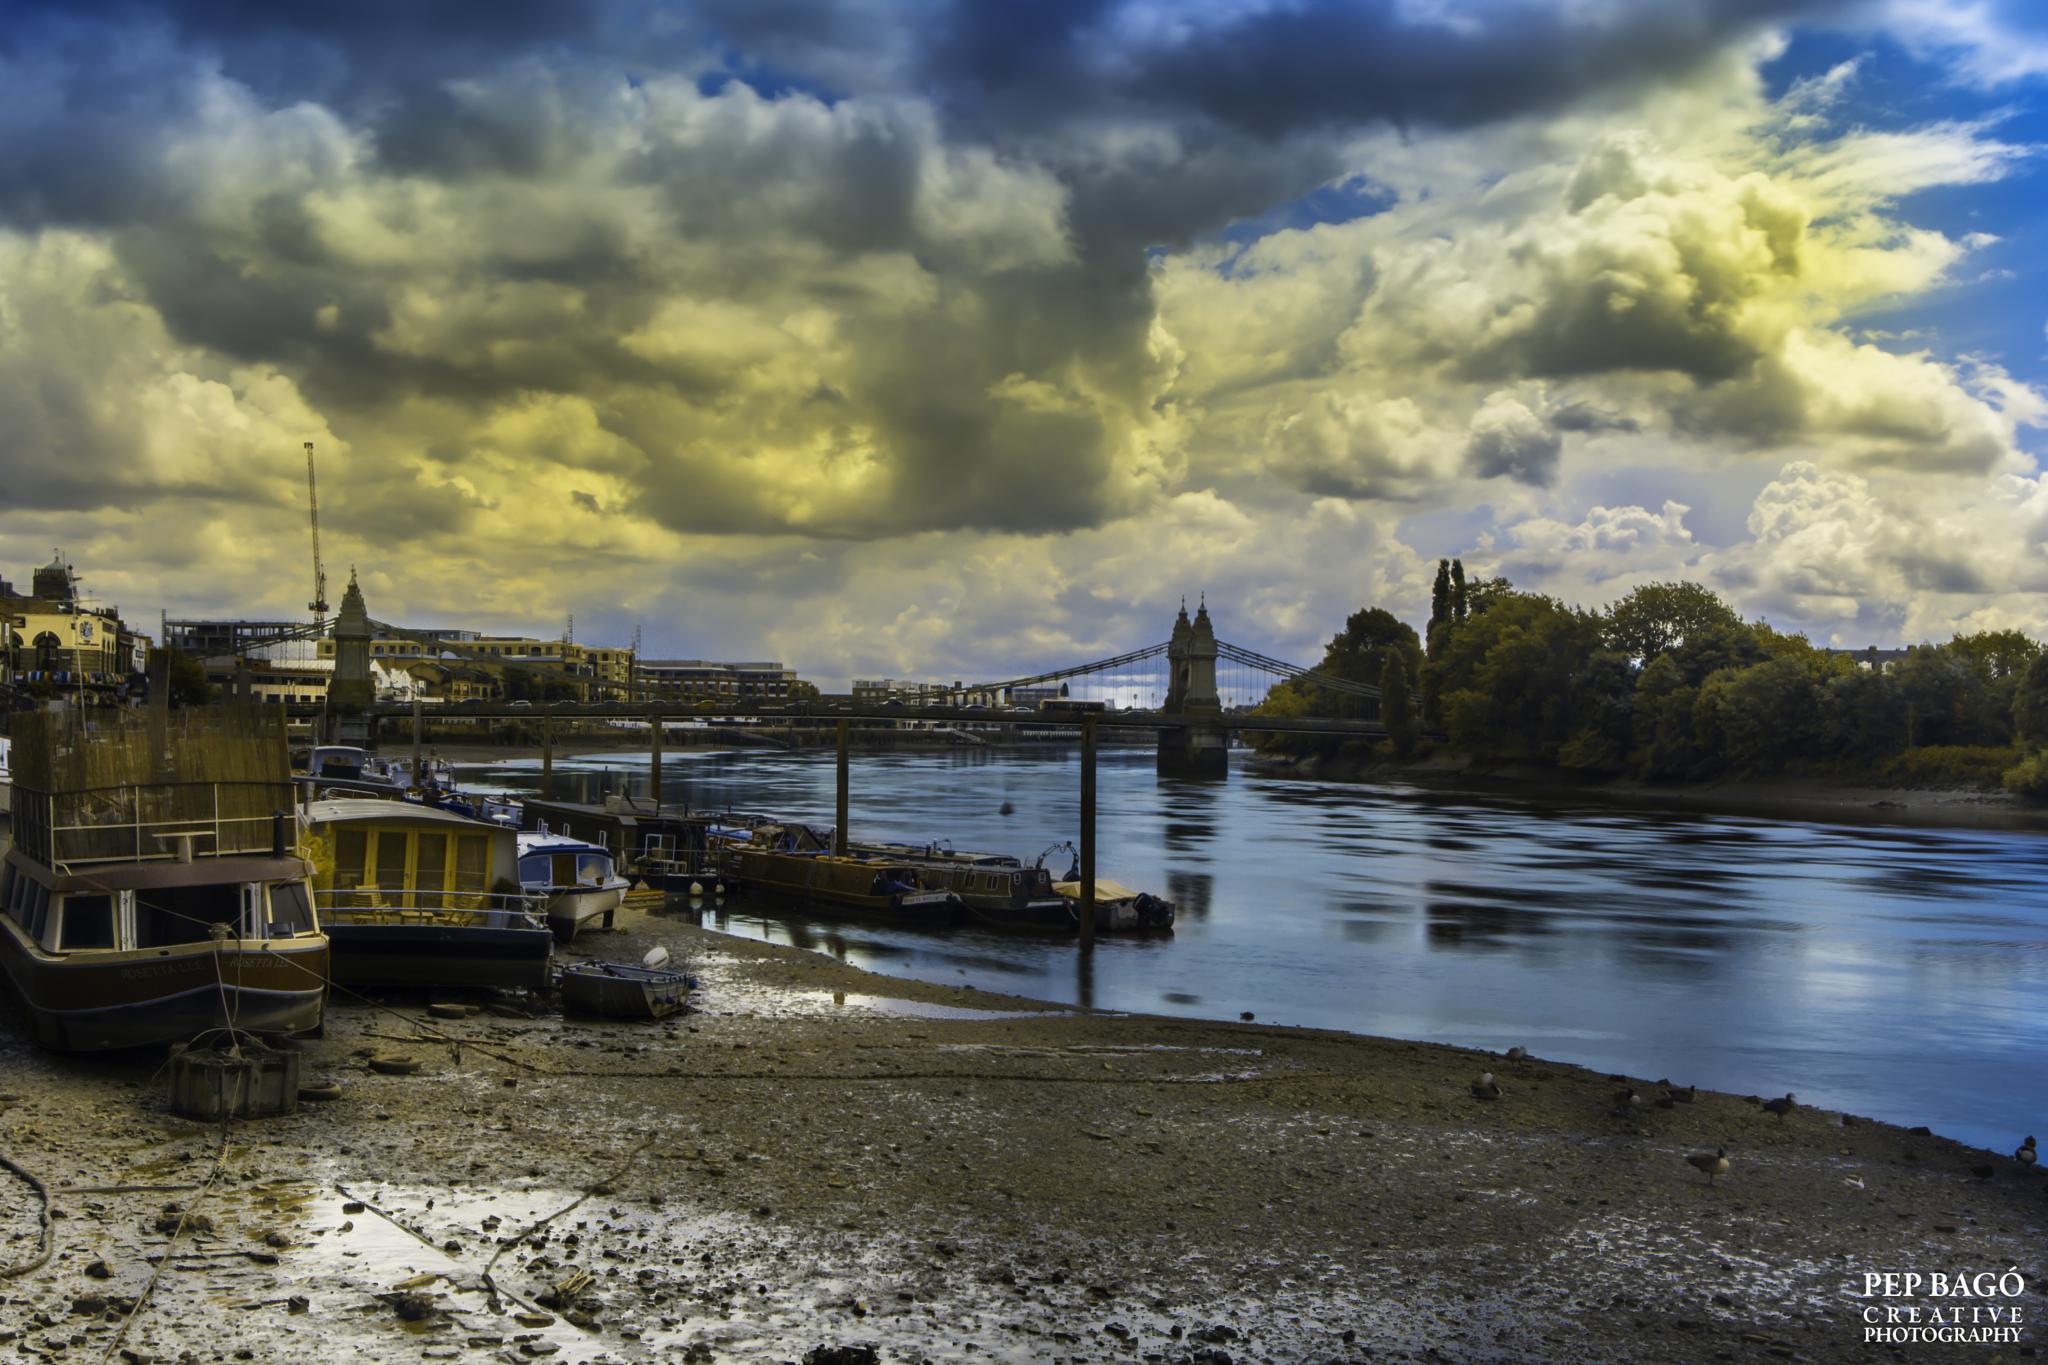 Hammersmith Marina by pepbago